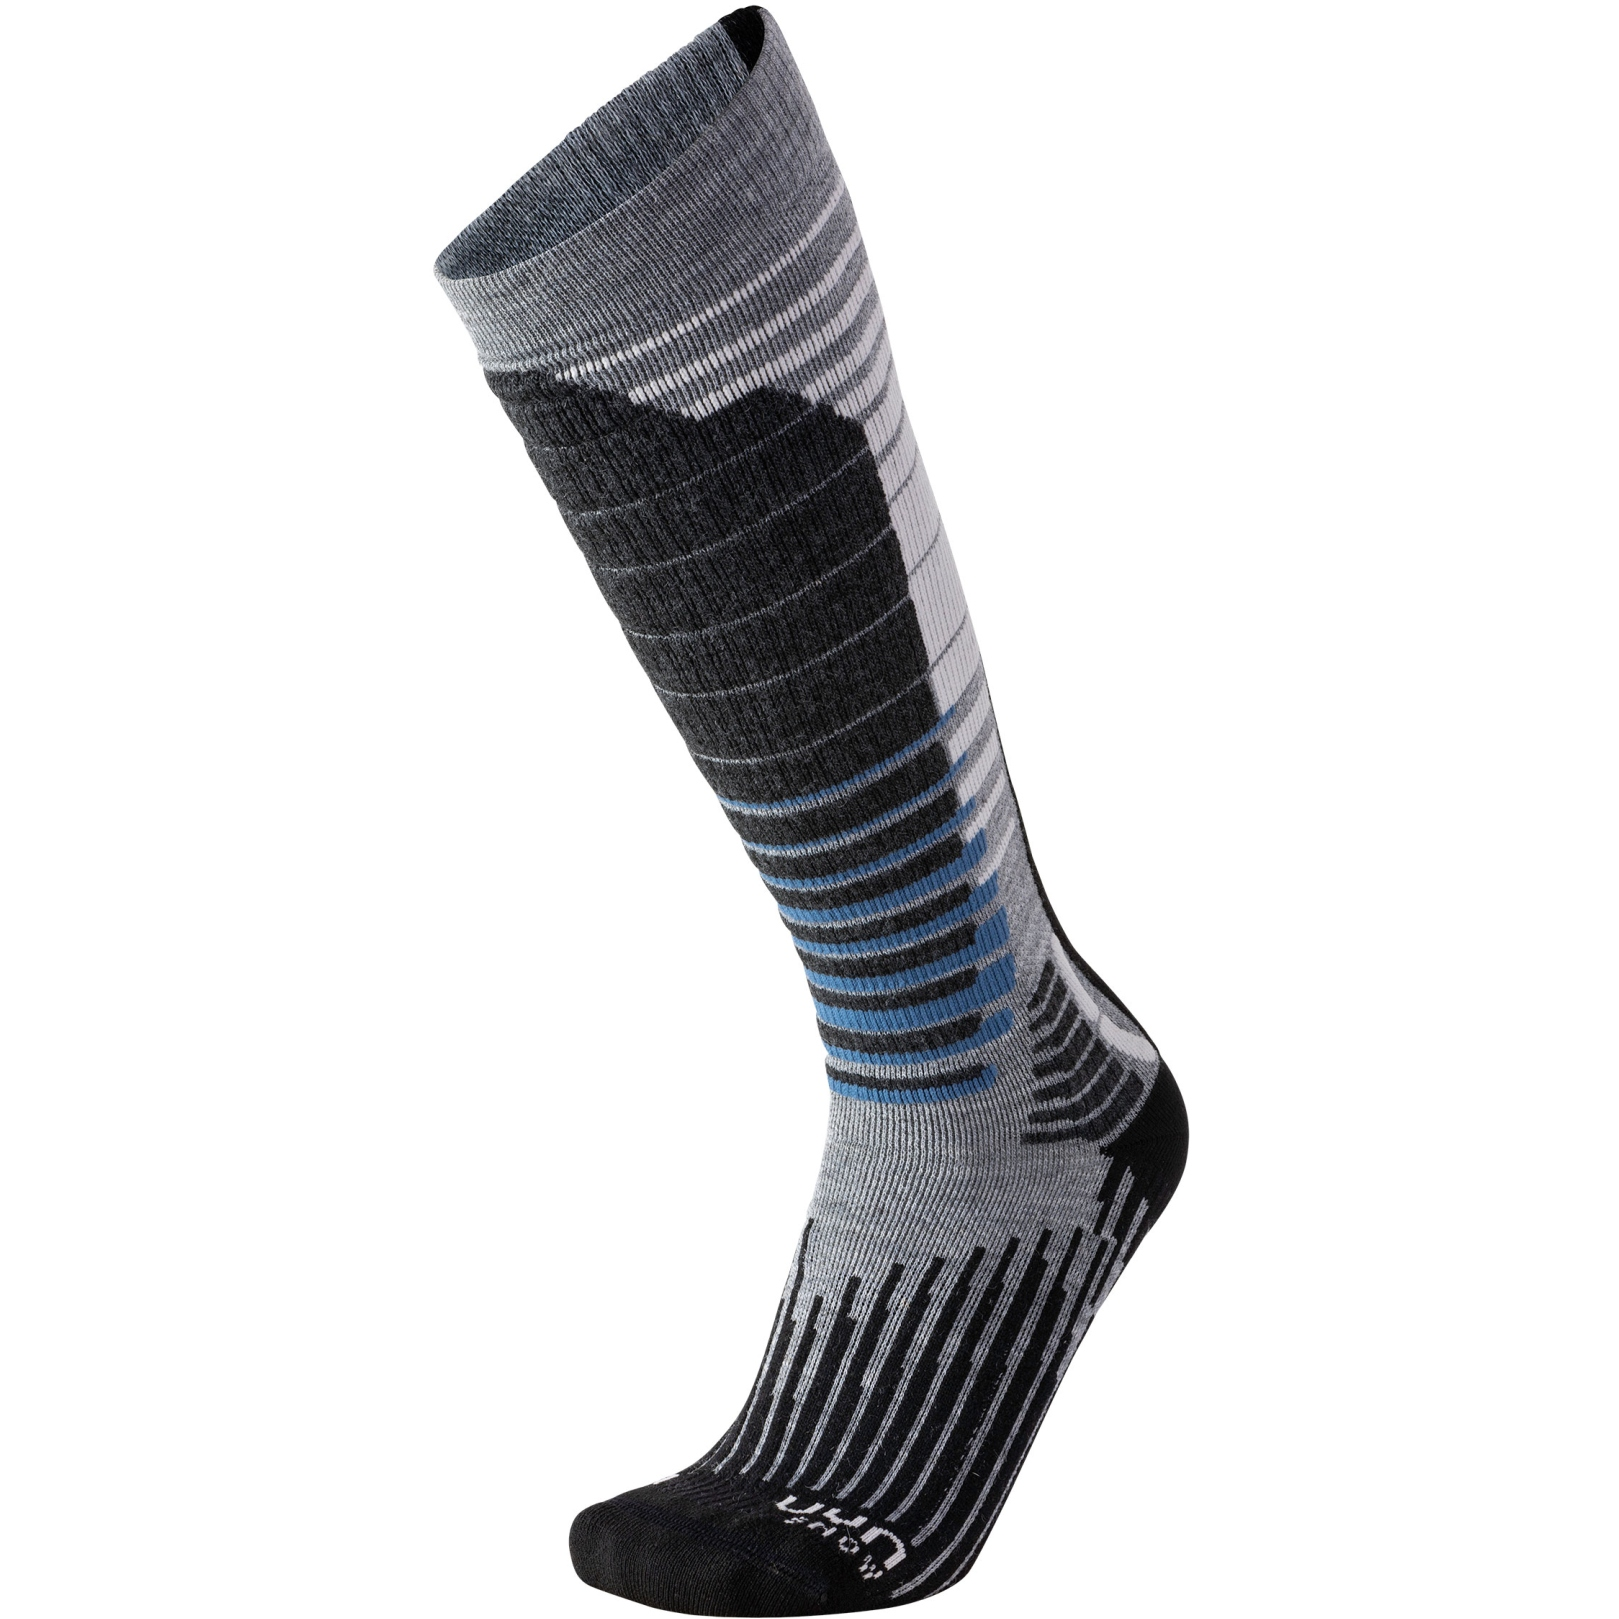 UYN Ski Man Snowboard Socks - Light Grey/Black